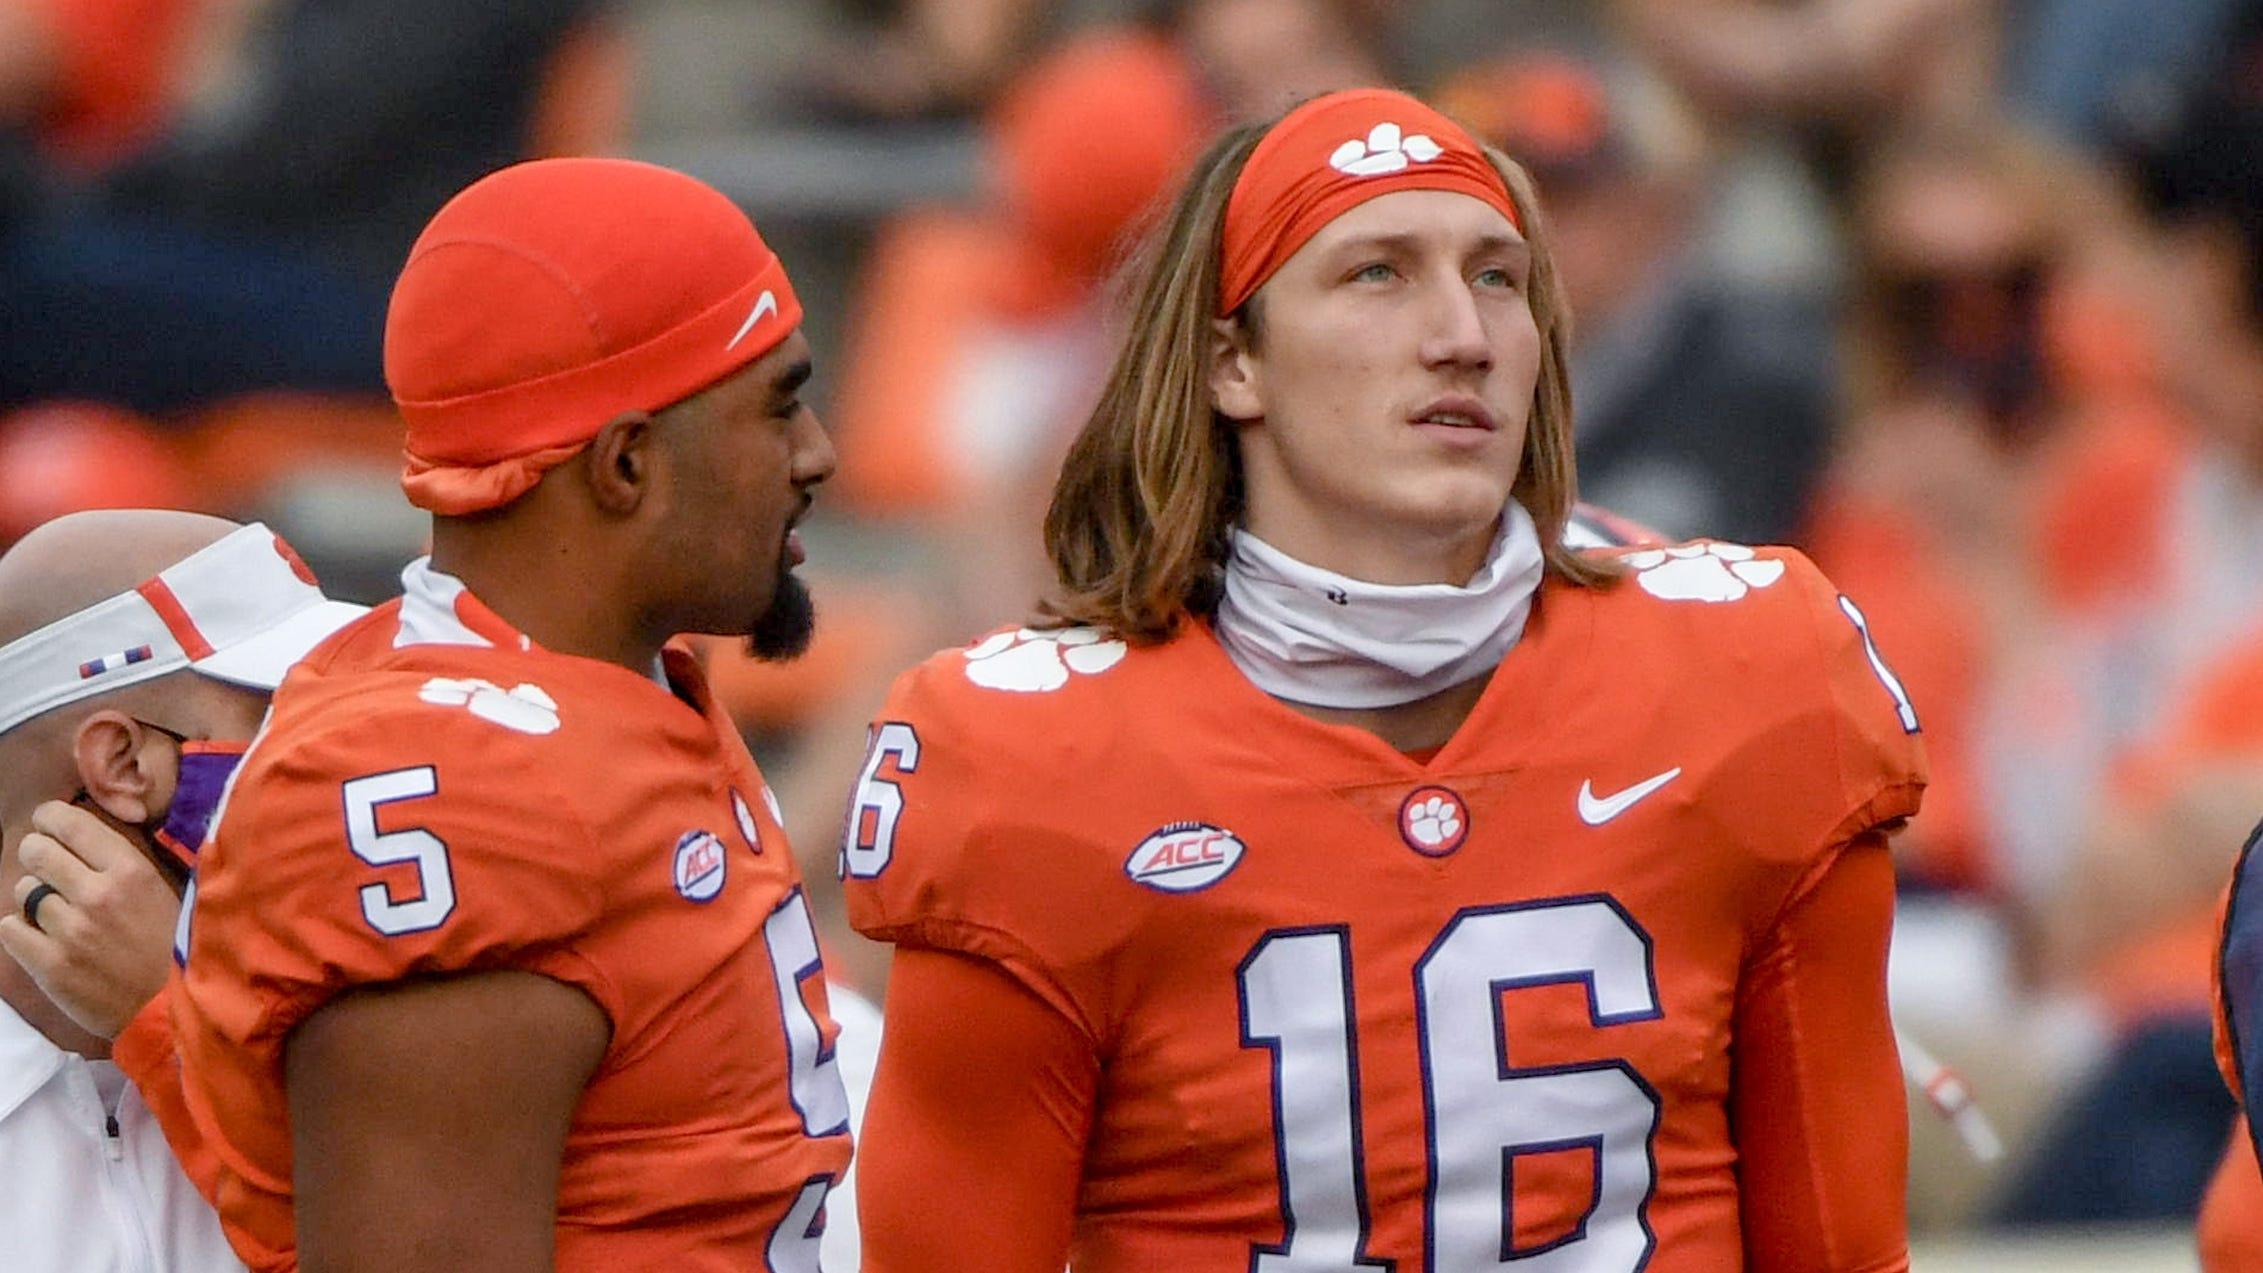 Clemson football has its eyes on Texas quarterback for 2022